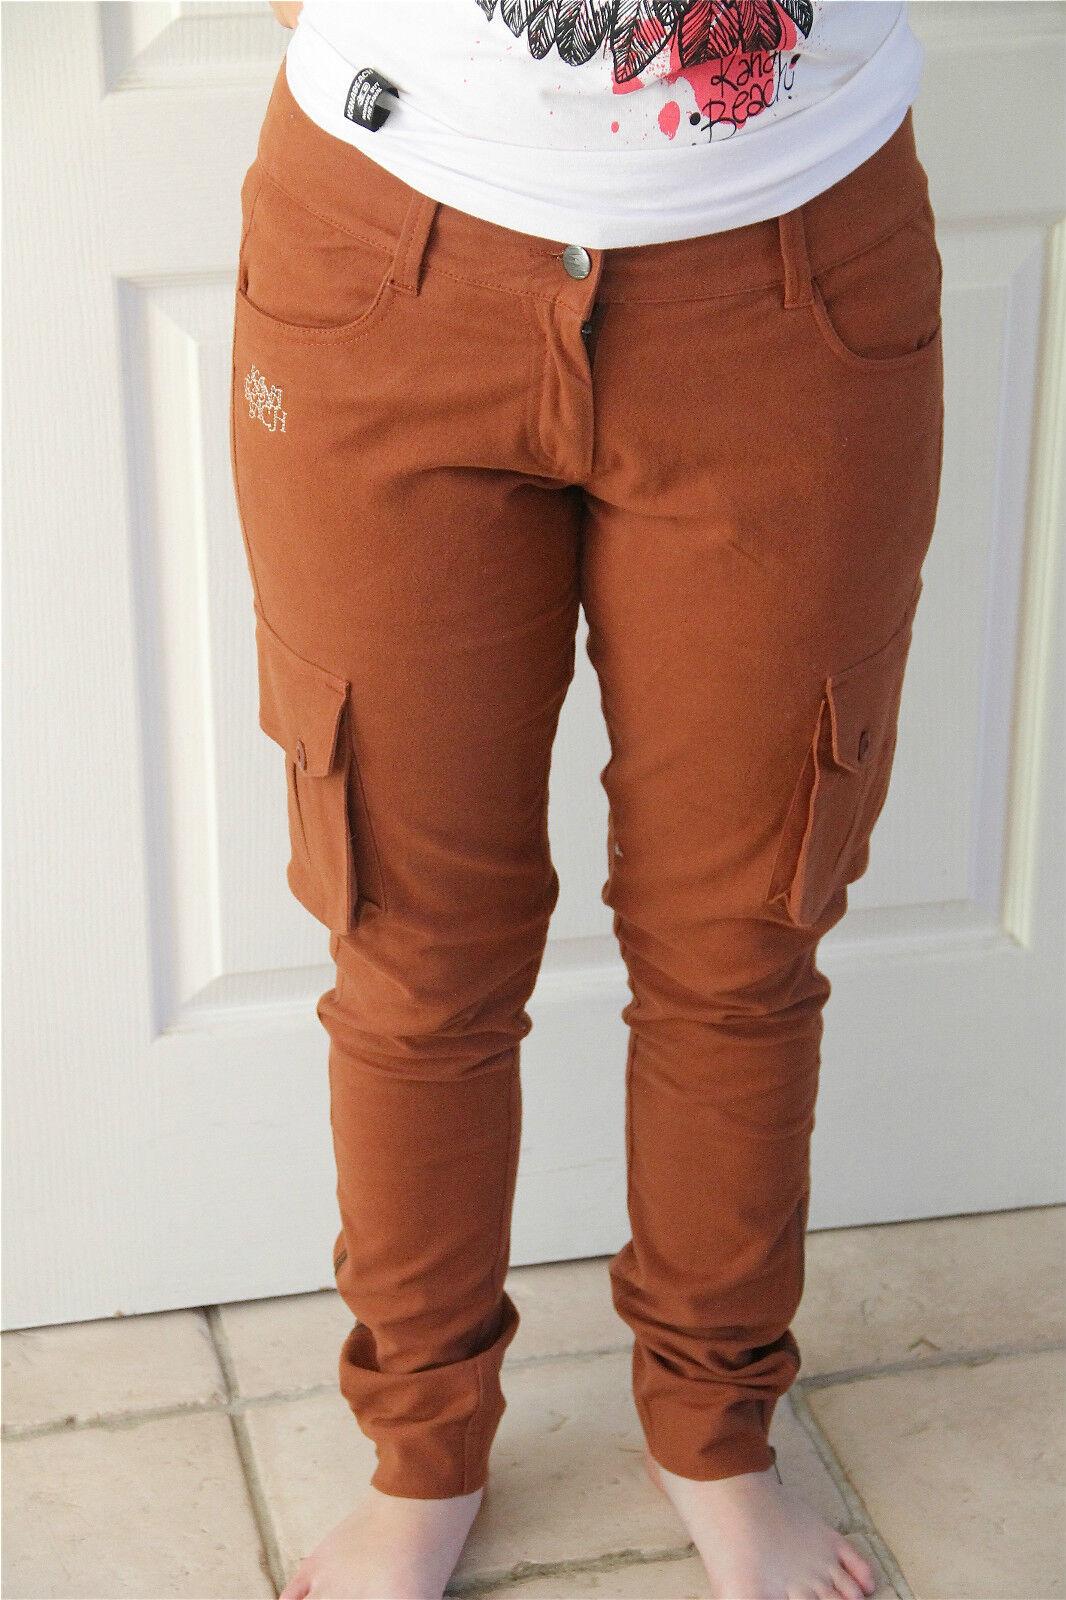 Pantalones sentido KANABEACH crunch T 38 NUEVO CON ETIQUETA valor